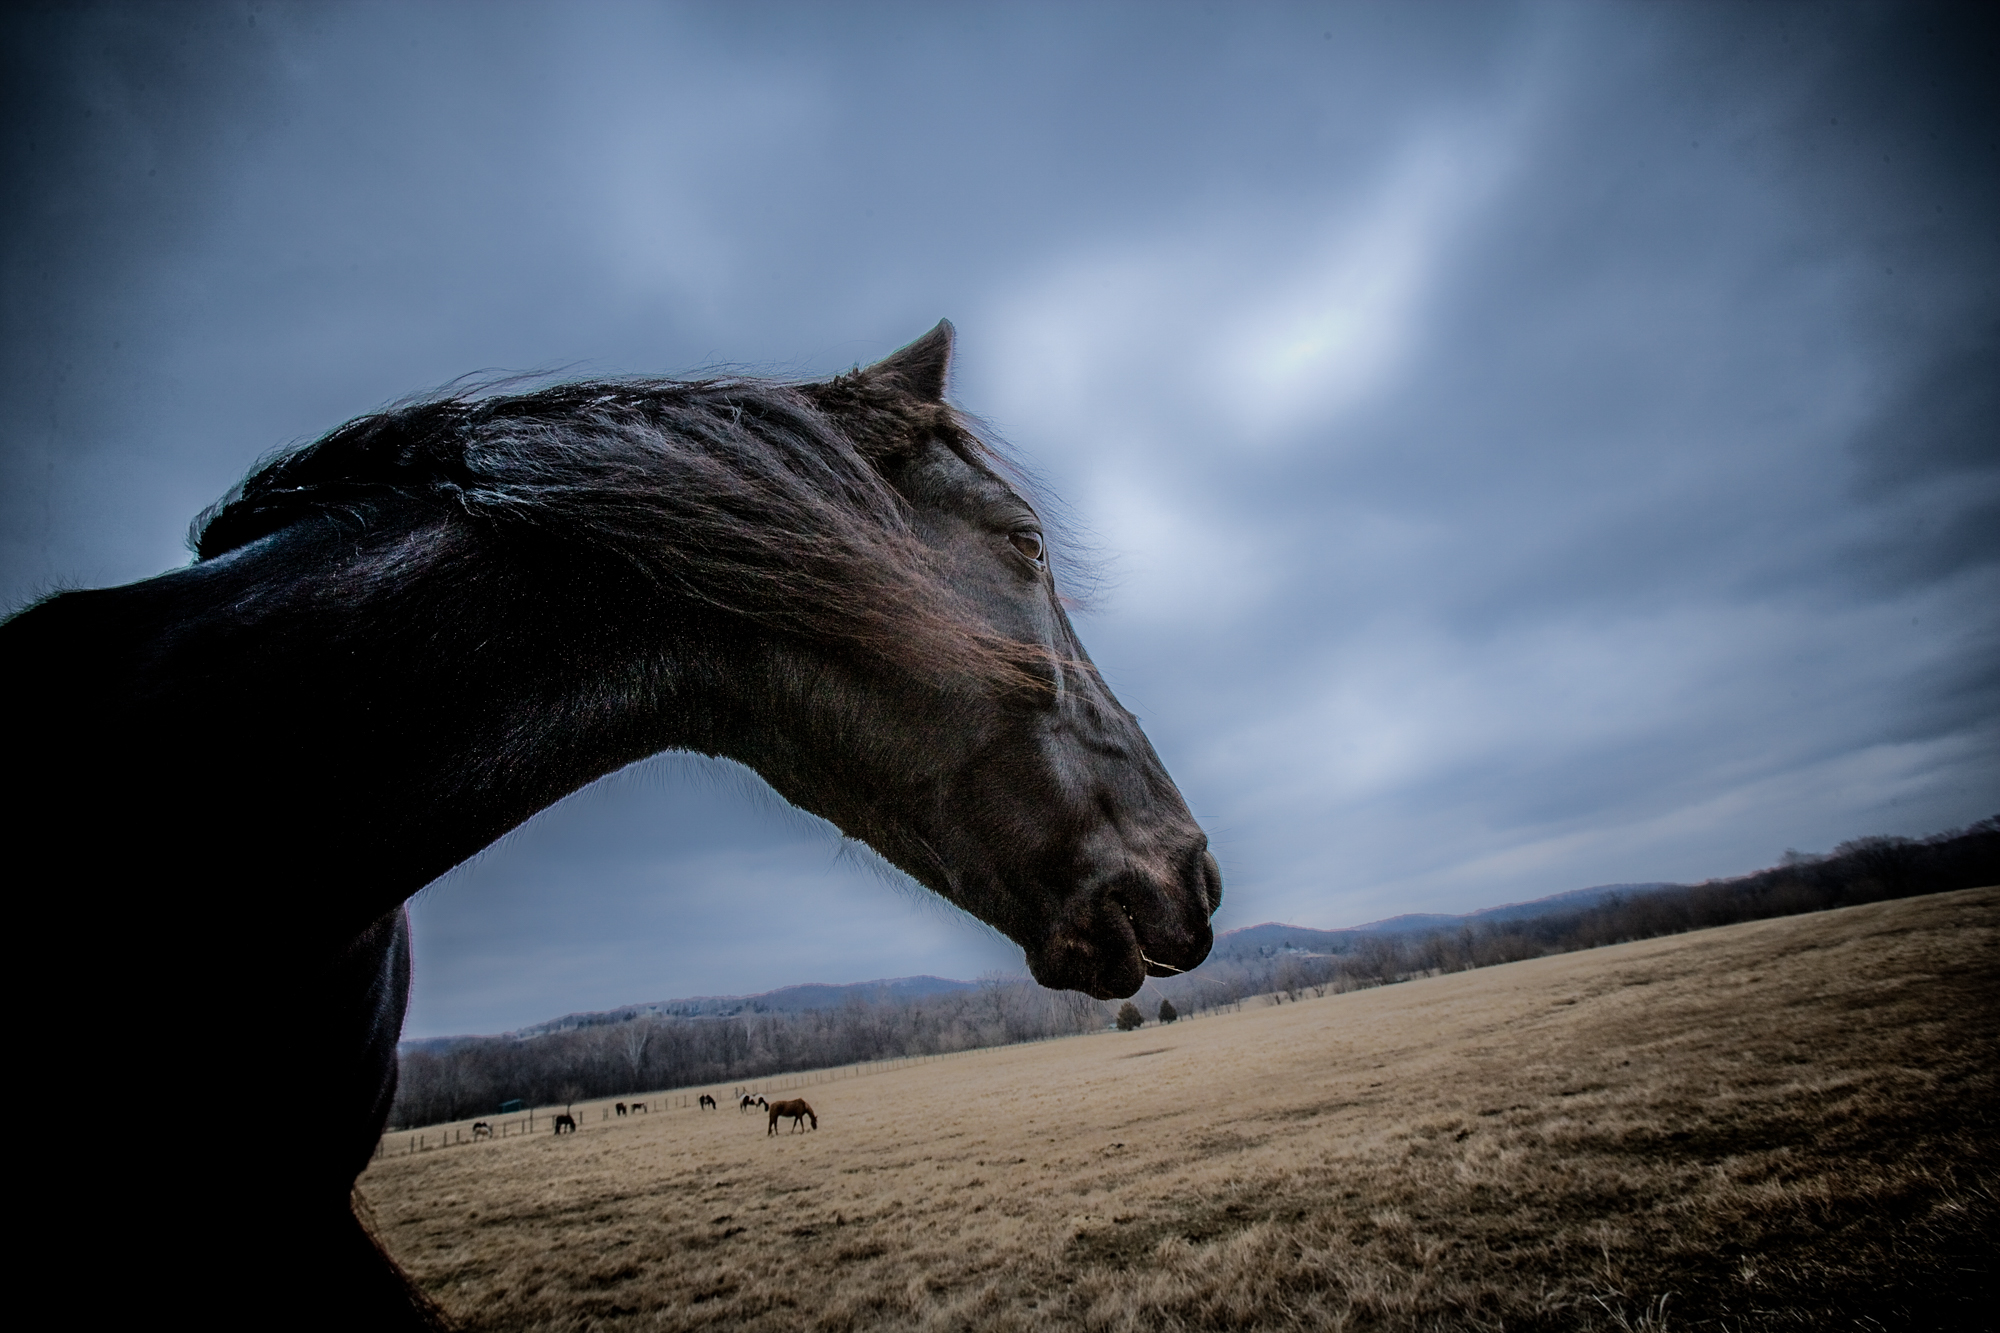 rick-meoli-commercial-photographer-outdoor-animal-lifestyle-repheads-71